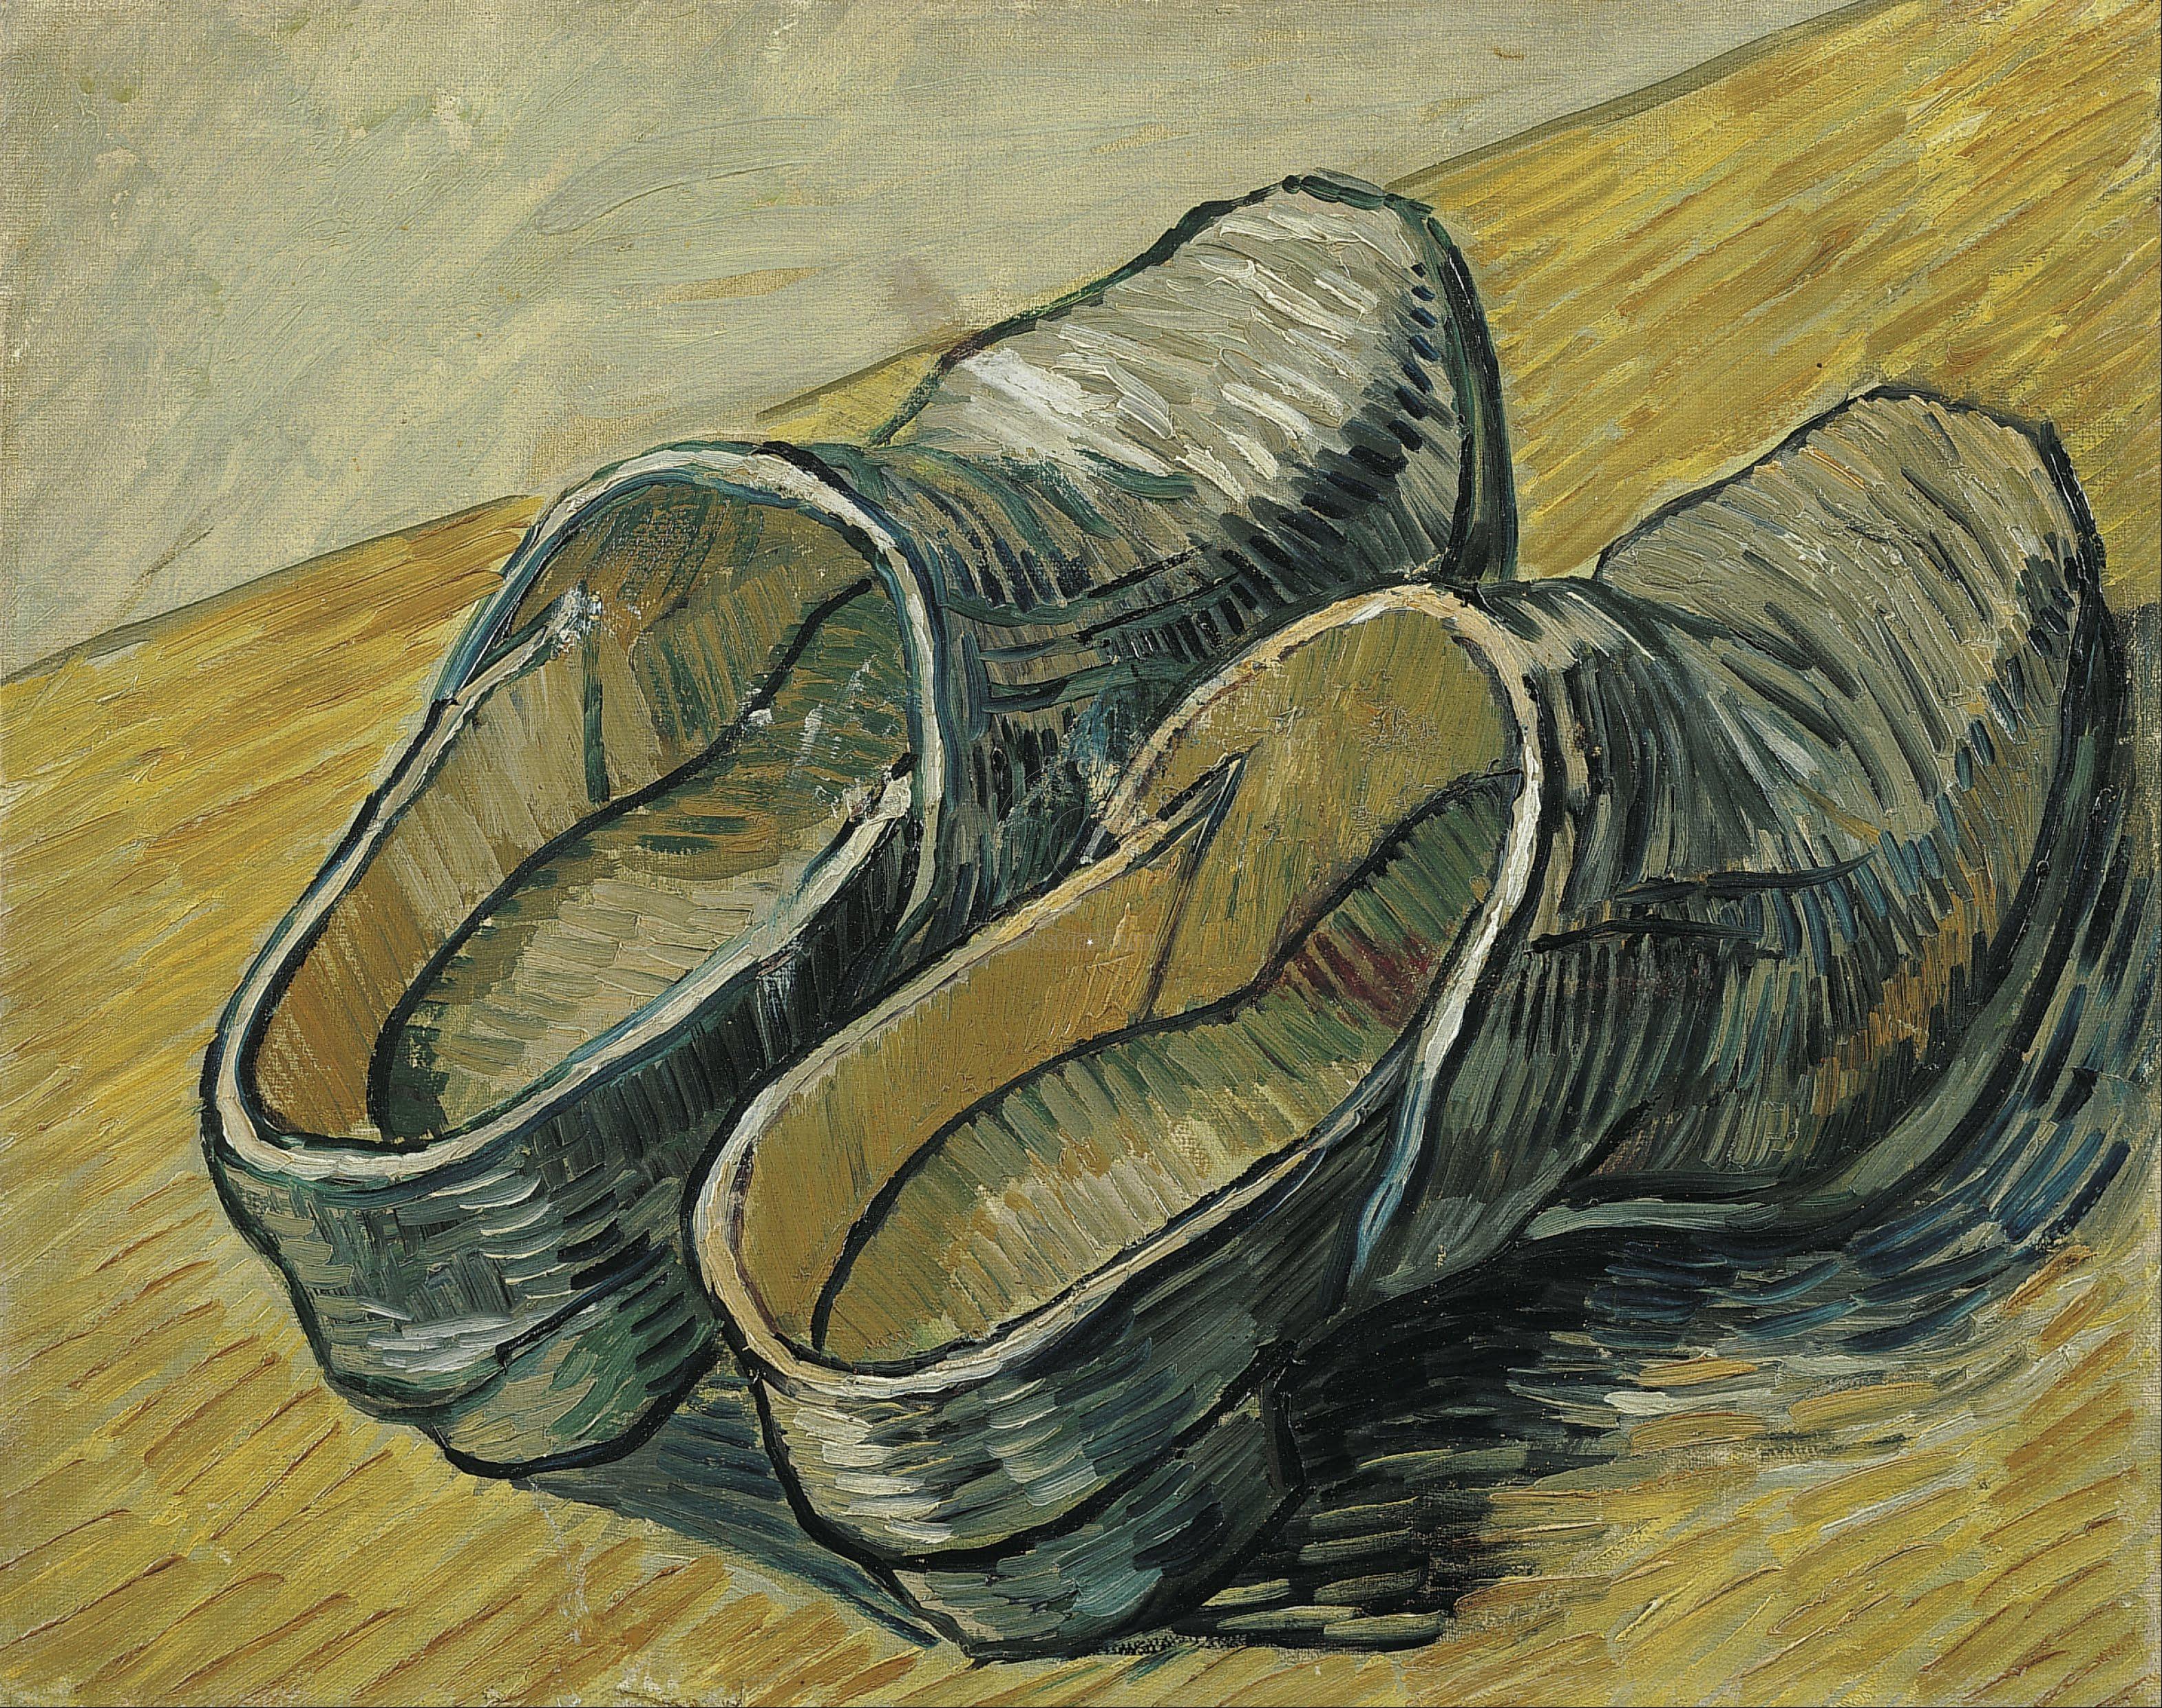 Vincent_van_Gogh_-_A_pair_of_leather_clogs_-_Google_Art_Project